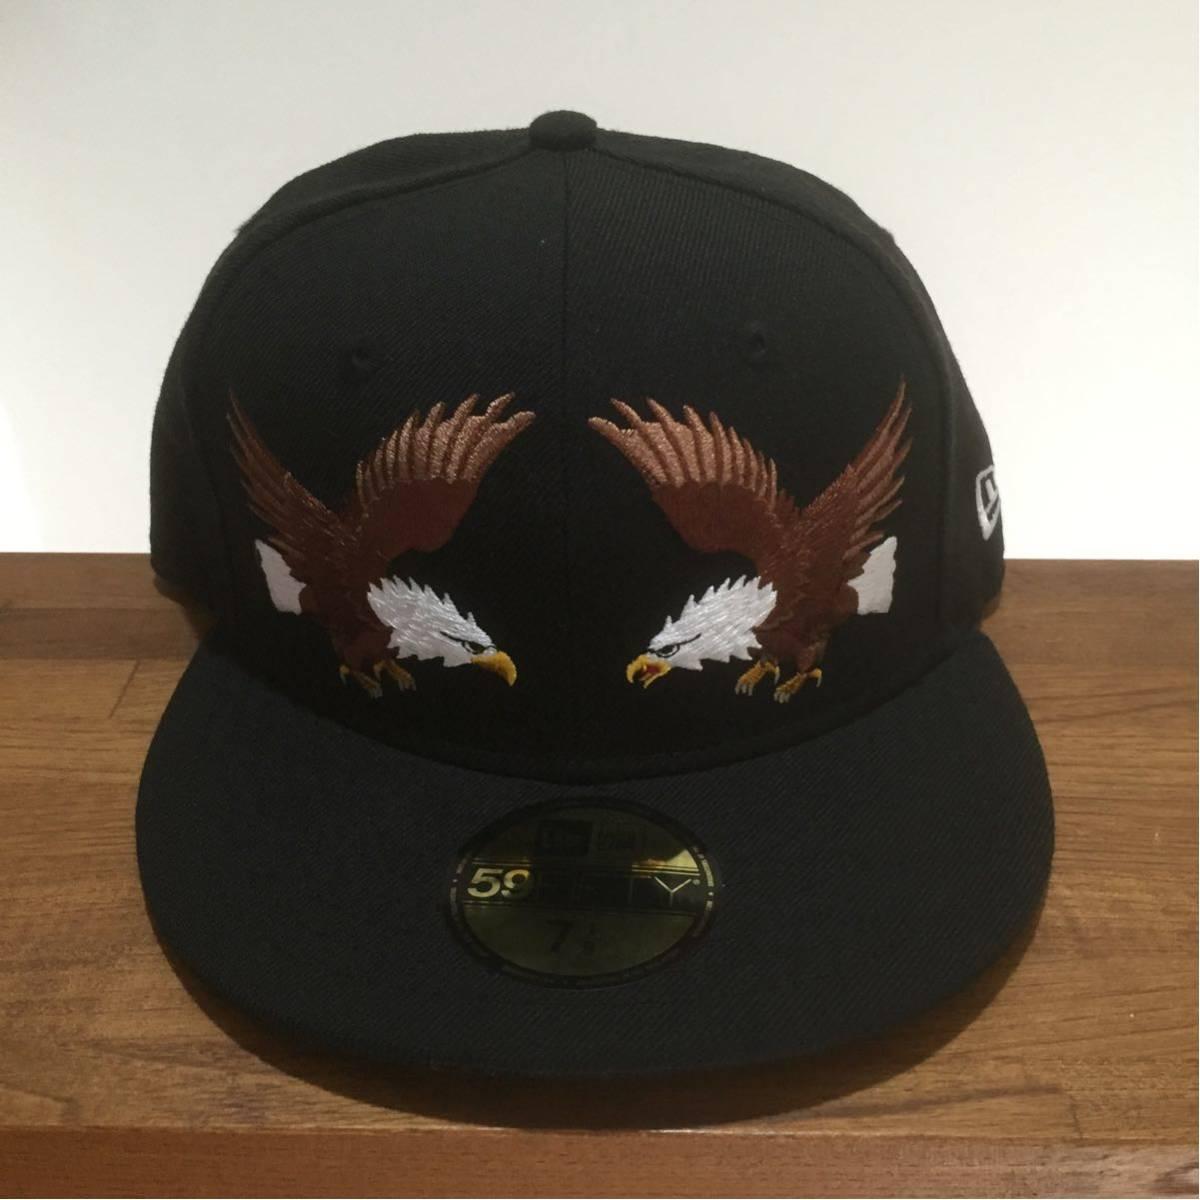 NEW ERA ニューエラ 59FIFTY スカジャンカスタム イーグル 鷲 刺繍 キャップ 帽子 野球帽 7 1/8 56.8cm 新品未使用 正規品 希少 限定 レア_画像2